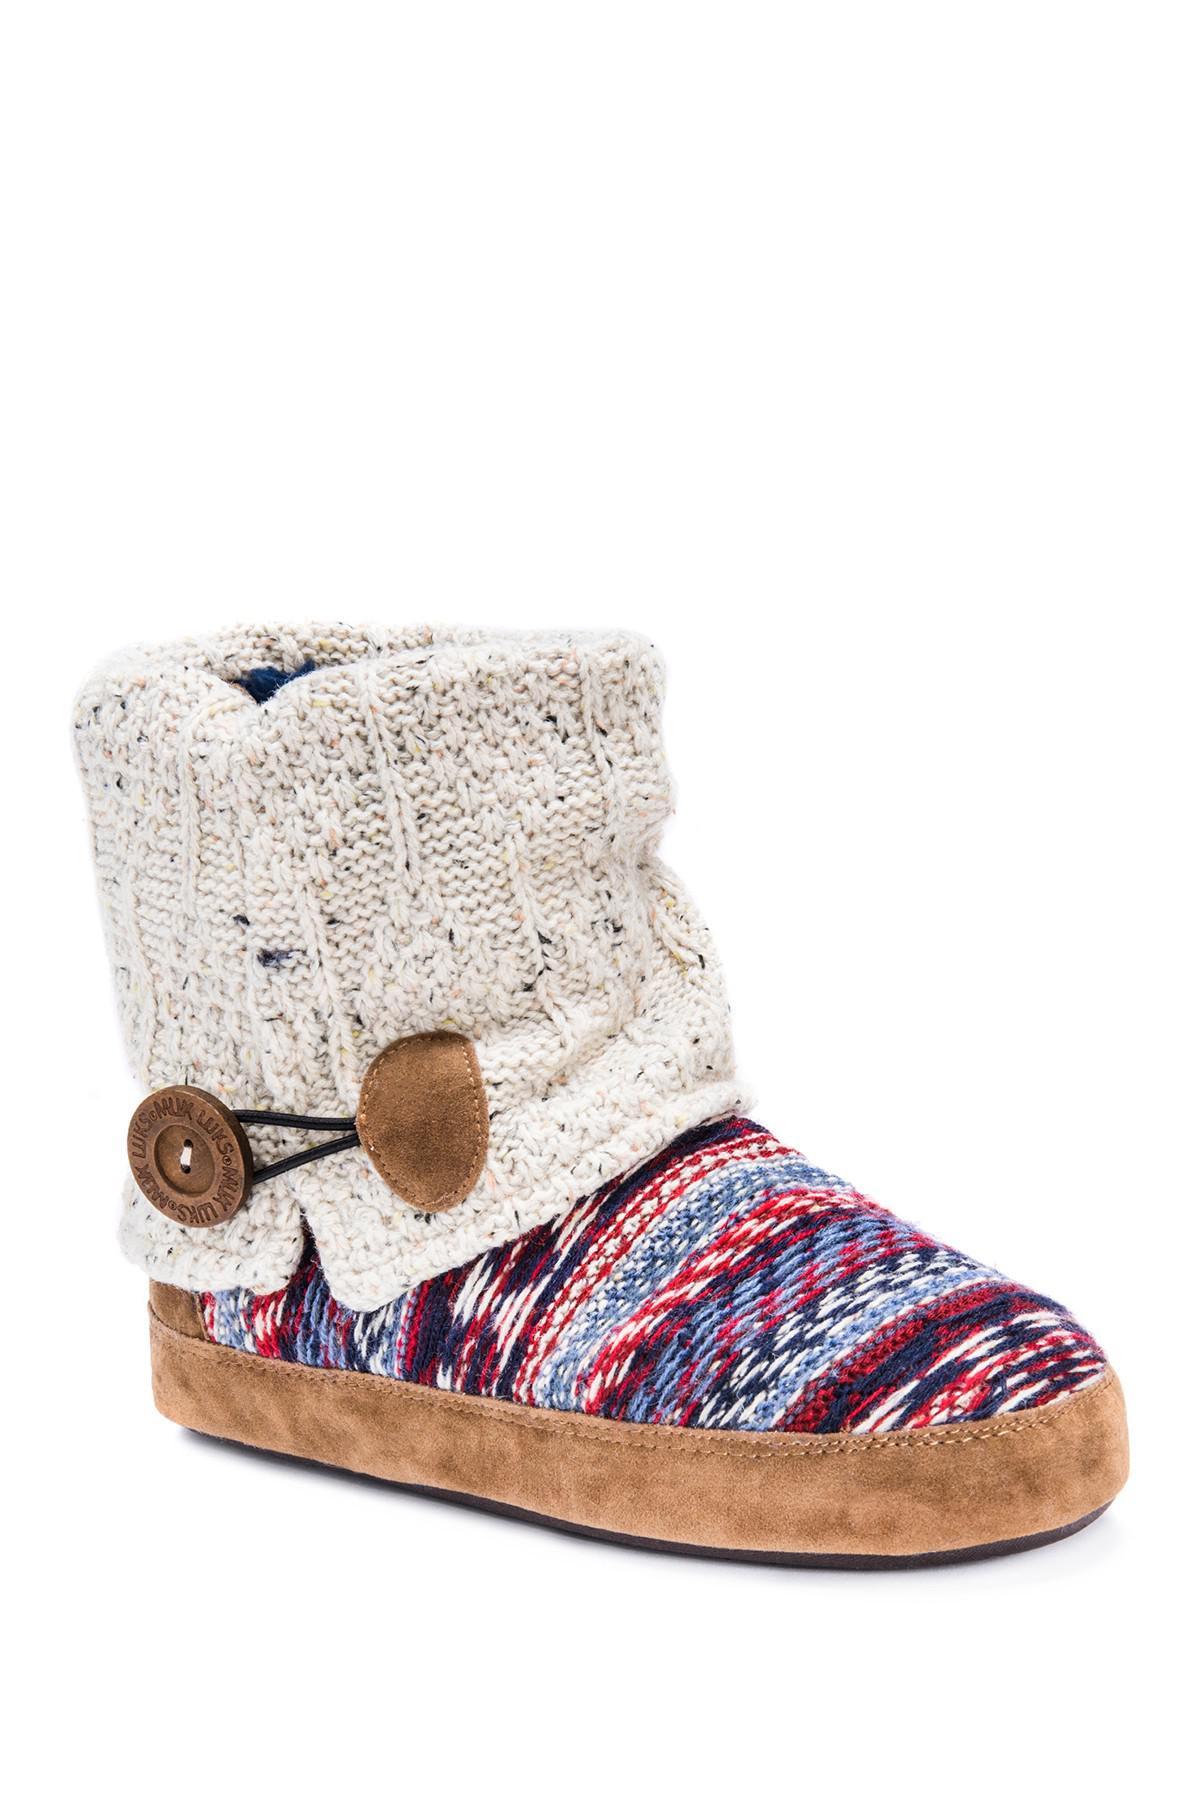 Prices For Sale Discount Hot Sale Dearfoams MFS Bootie Slipper with Notch Sherpa Cuff(Women's) -Black Outlet Pick A Best UrSNcmrR8s